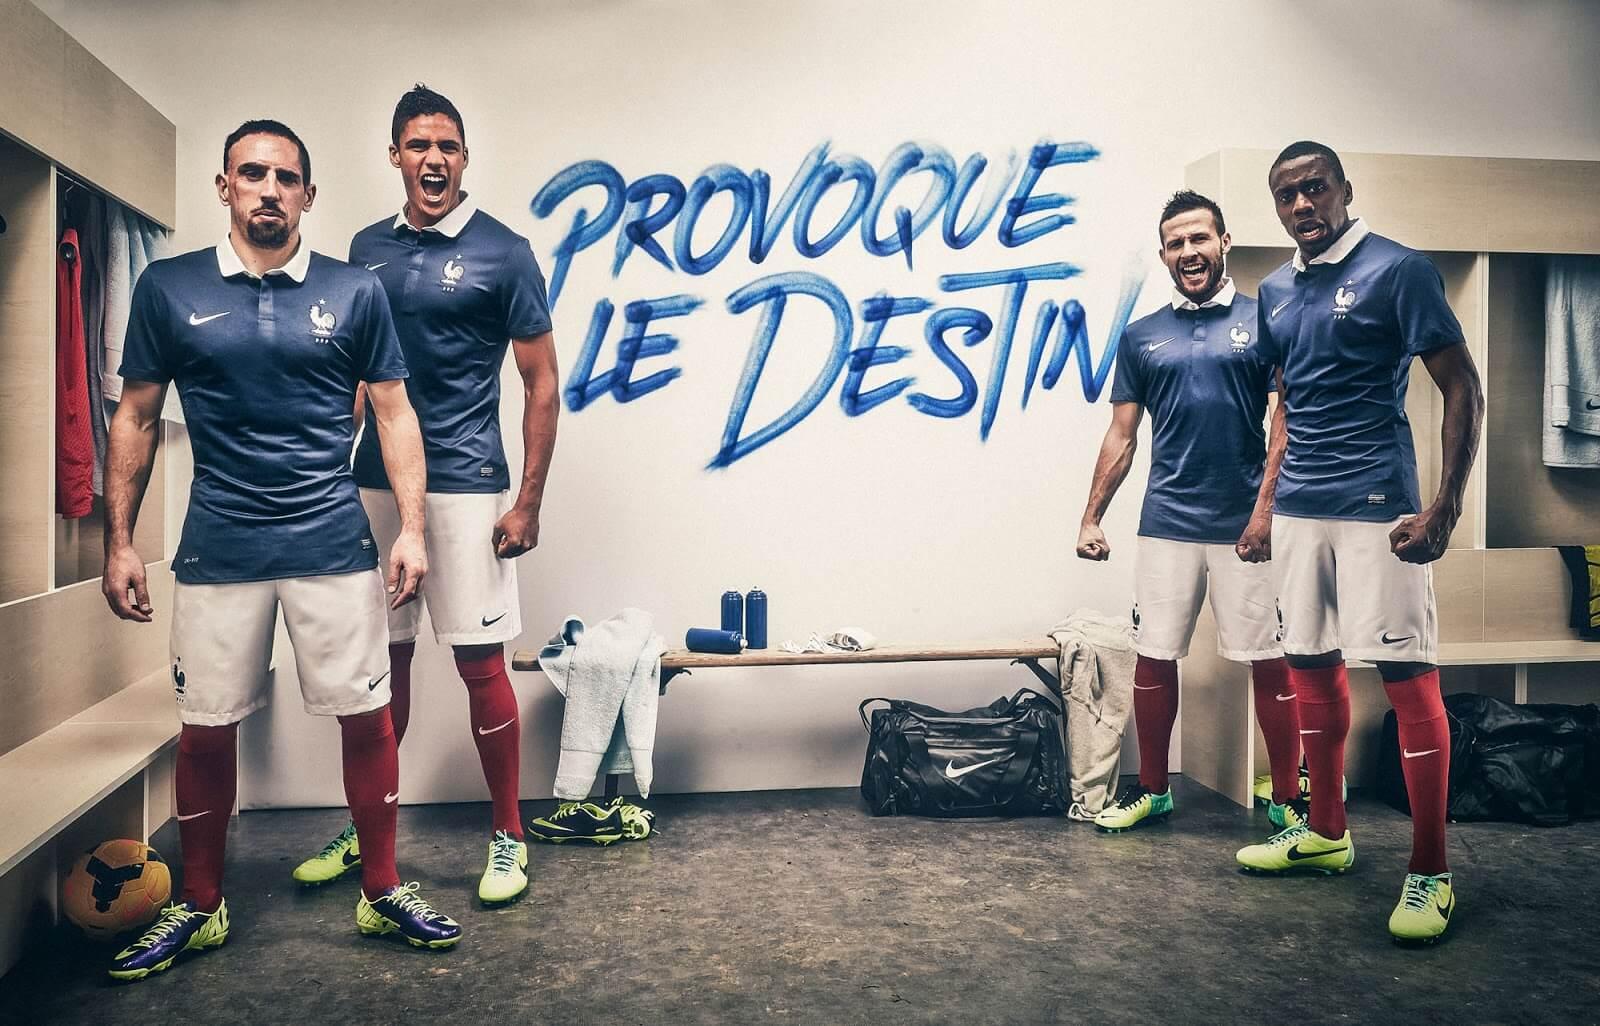 France Euro 2016 Football Team Wallpapers